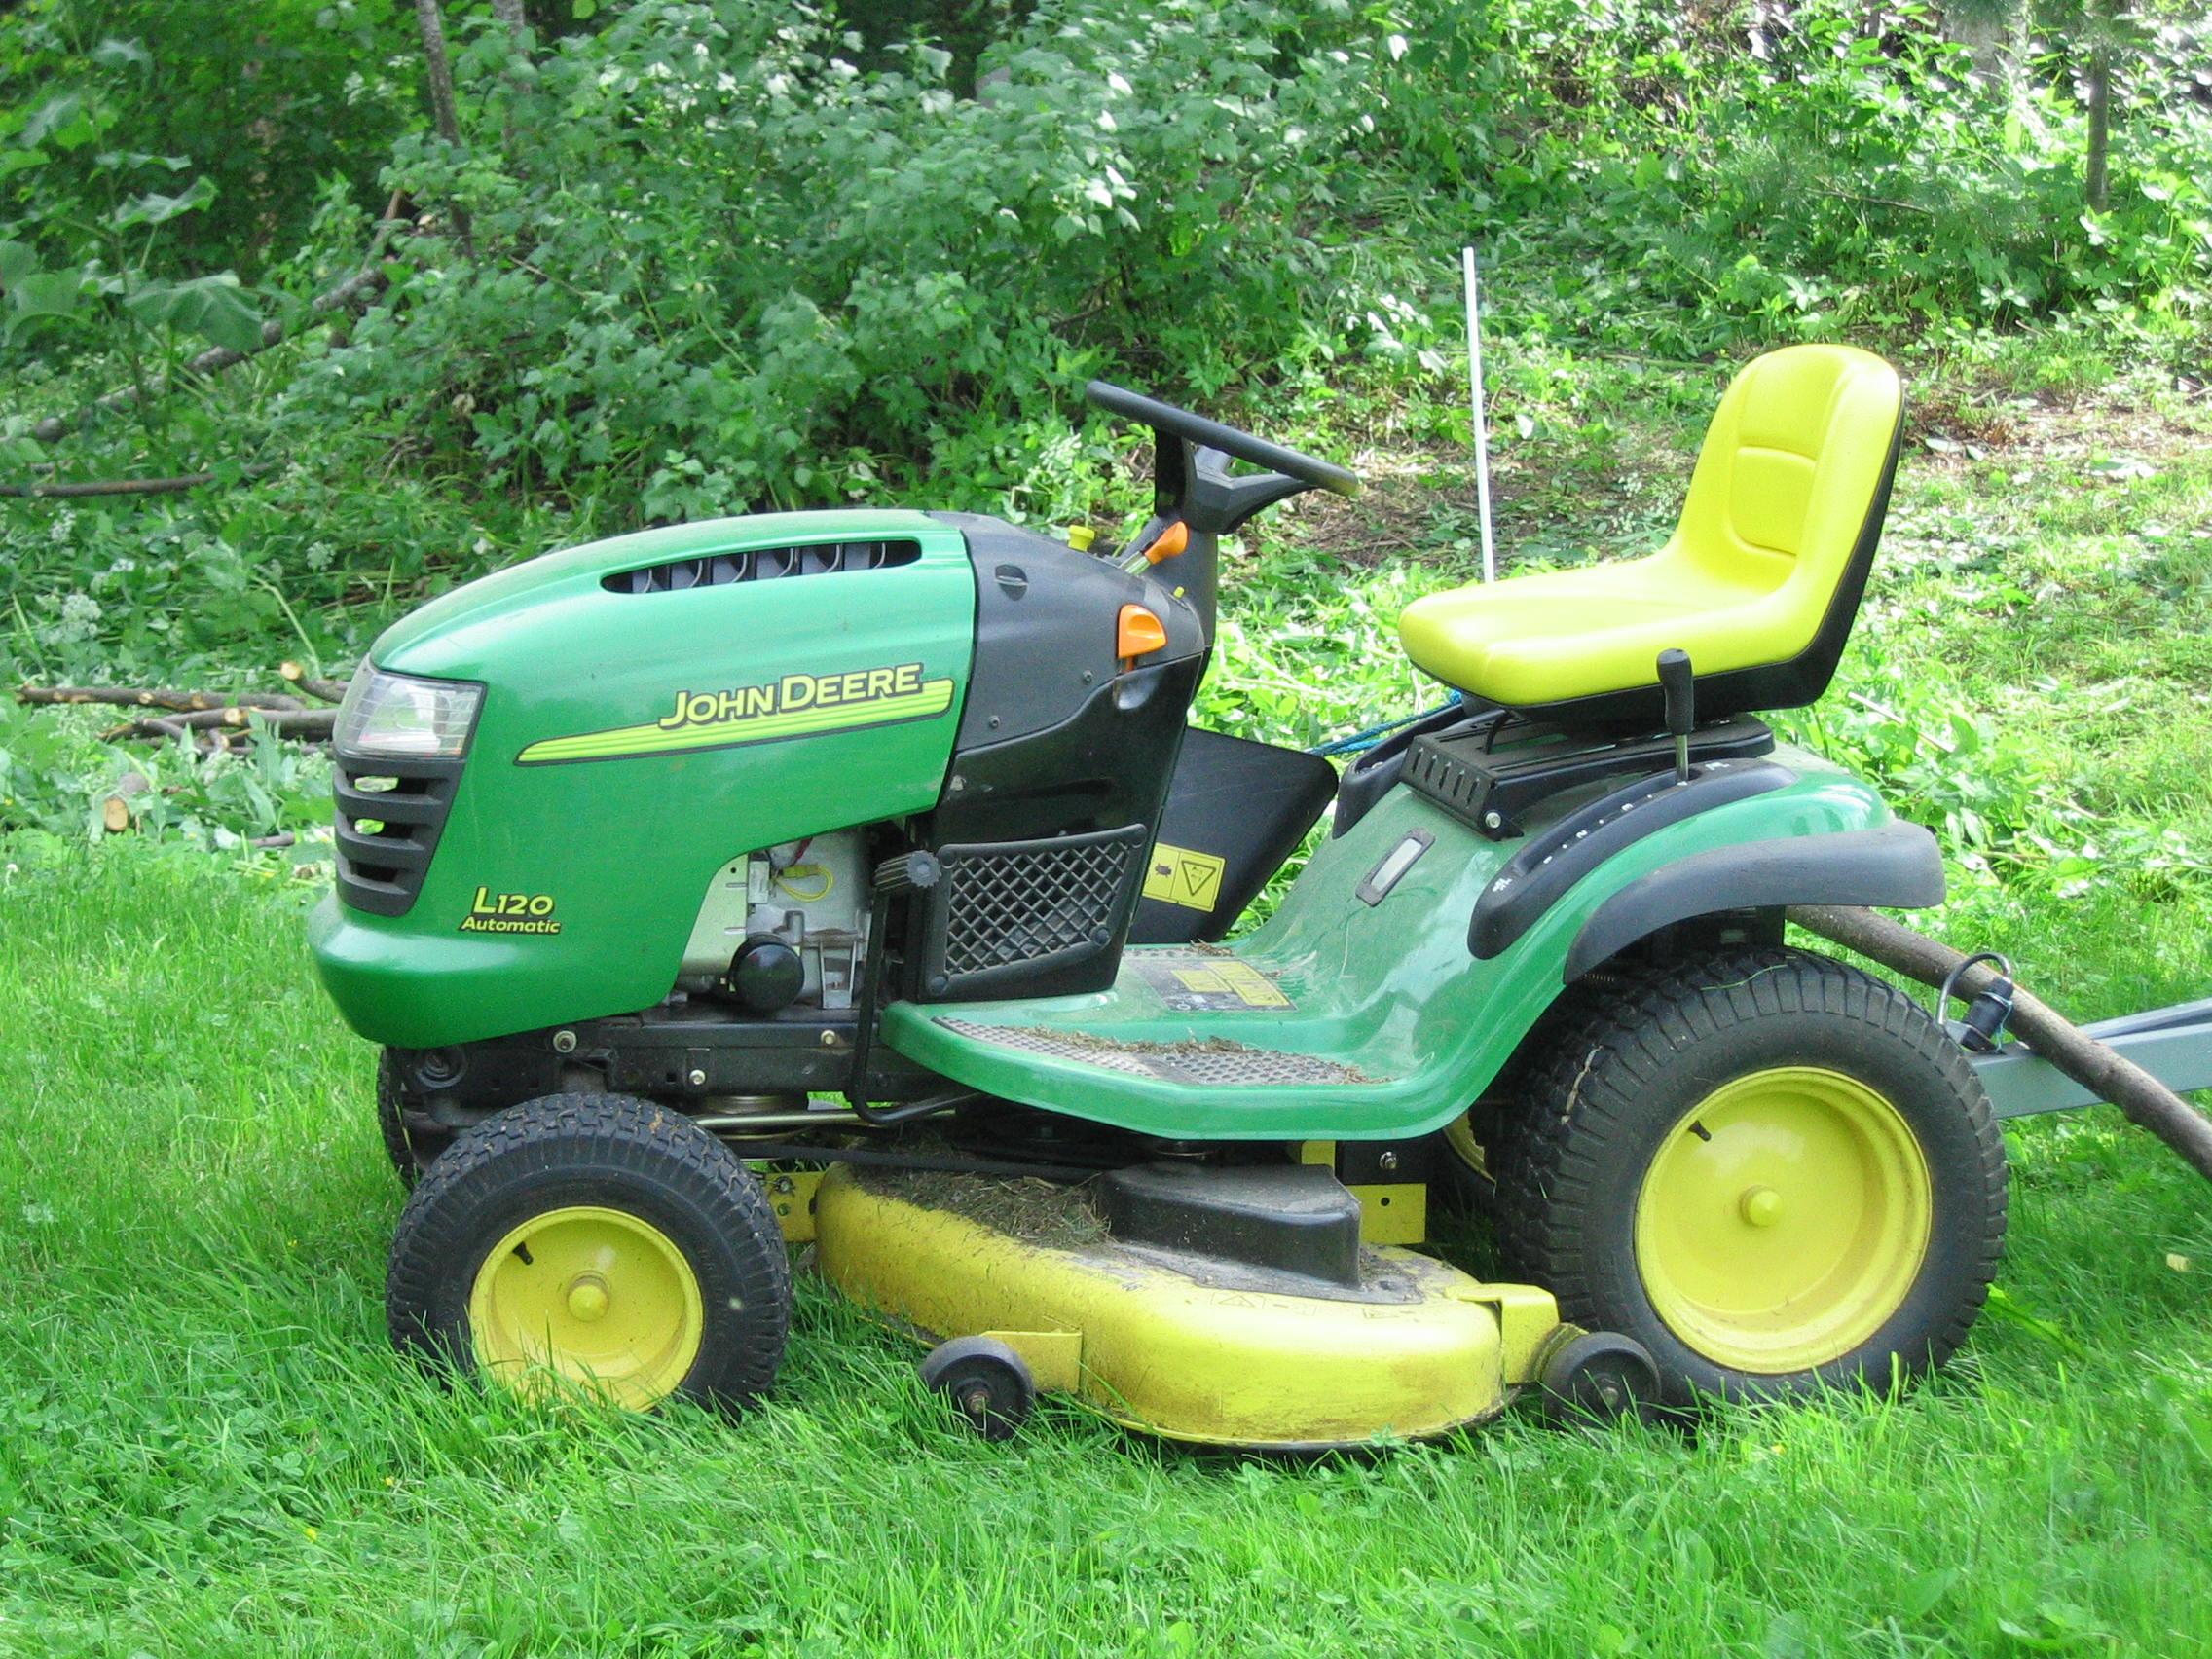 John Deere Lawn Tractors Images & Pictures - Becuo